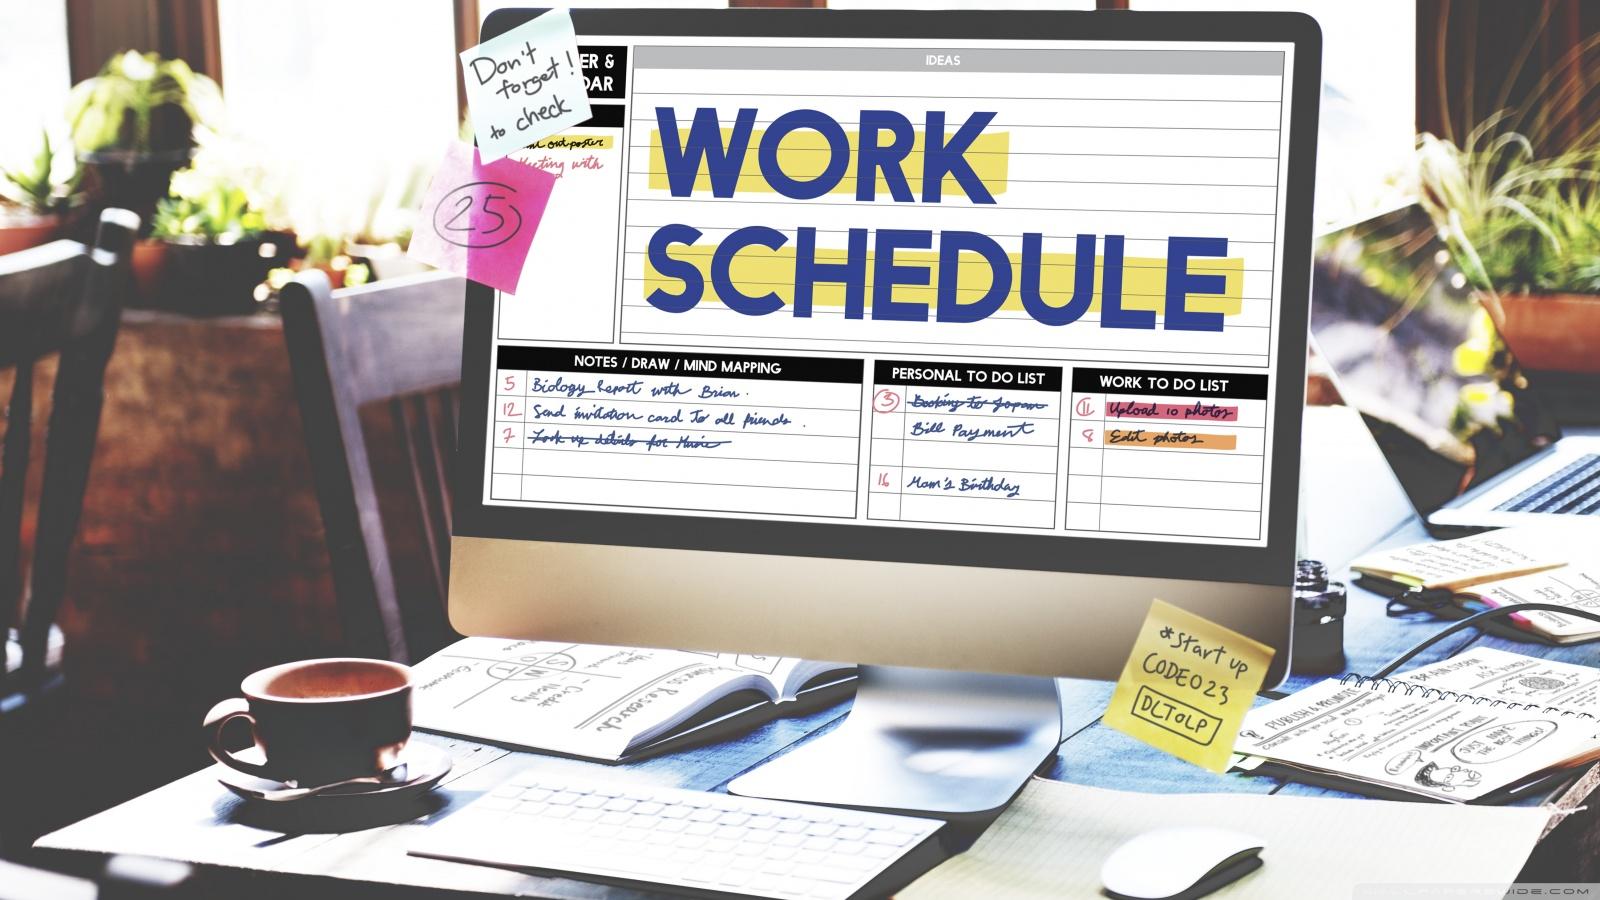 work_schedule-wallpaper-1600x900